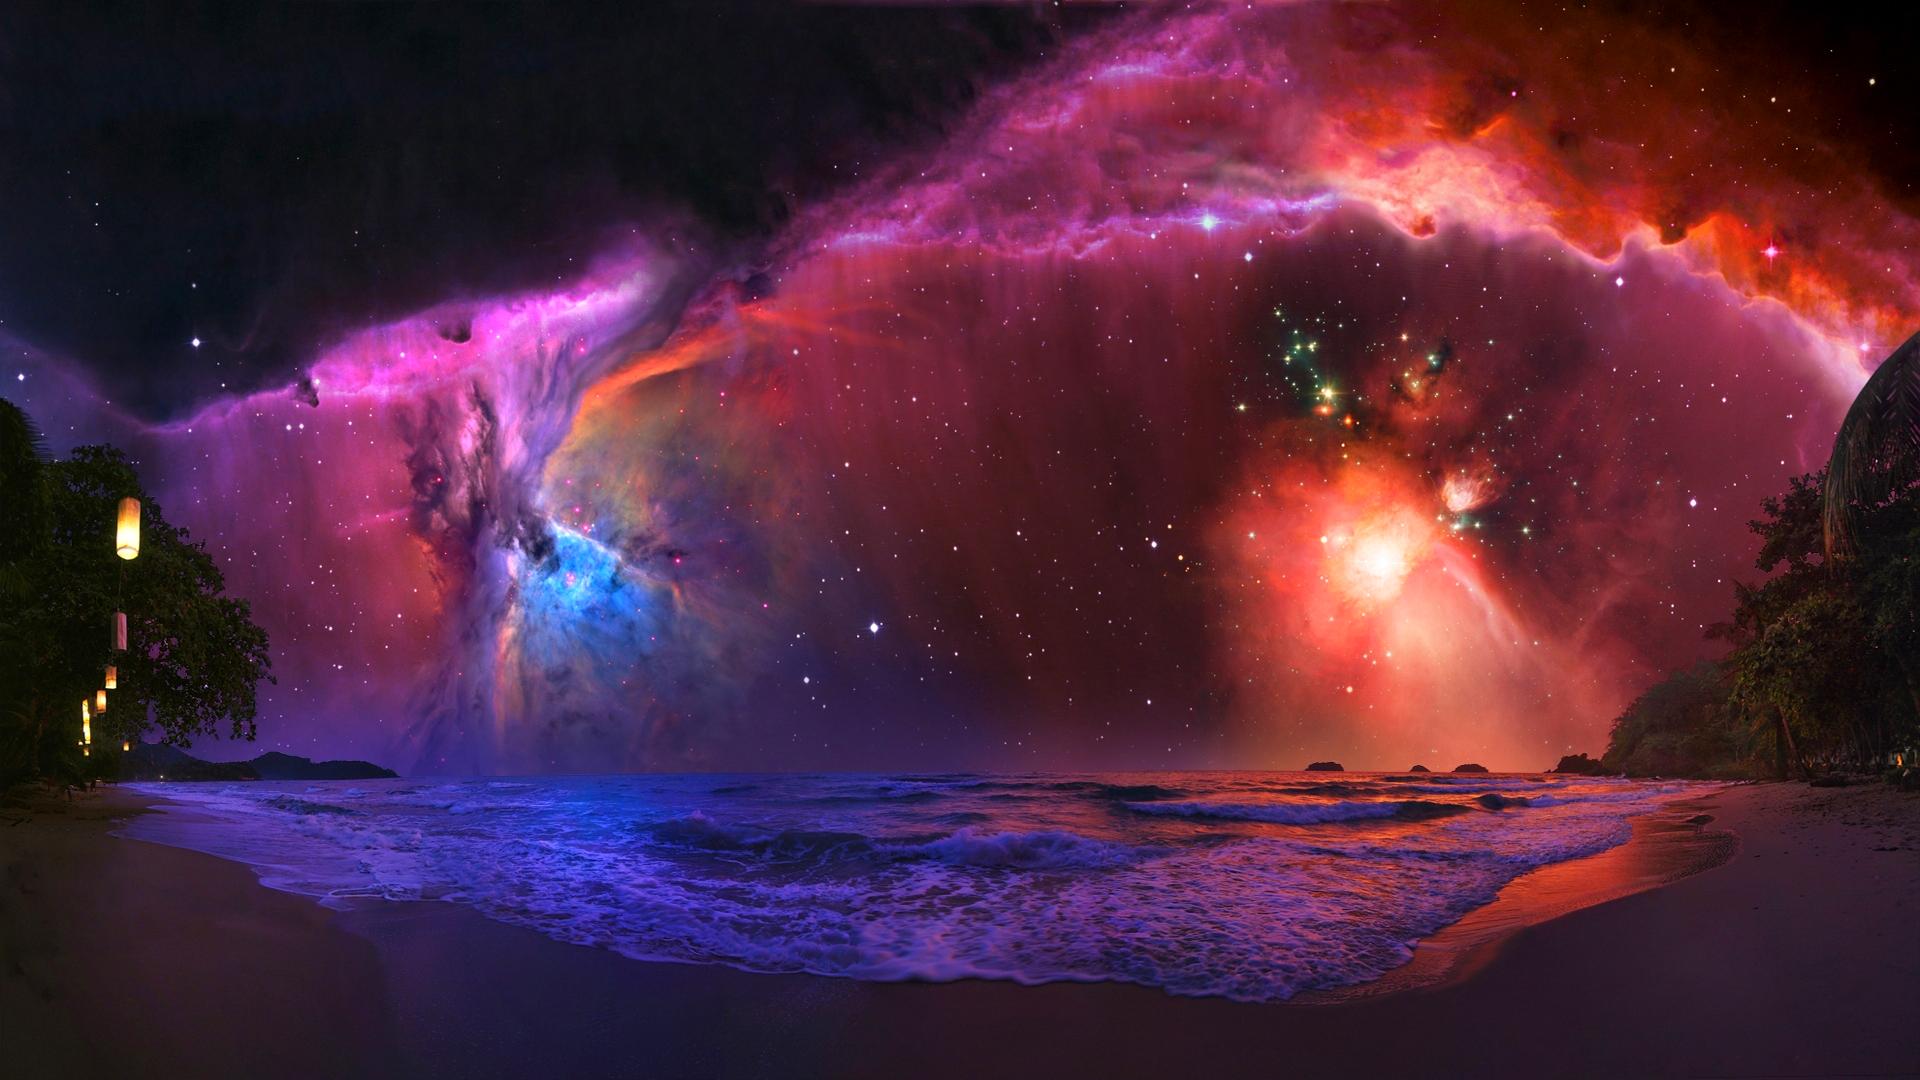 nebula galaxy beach vibrant stars space